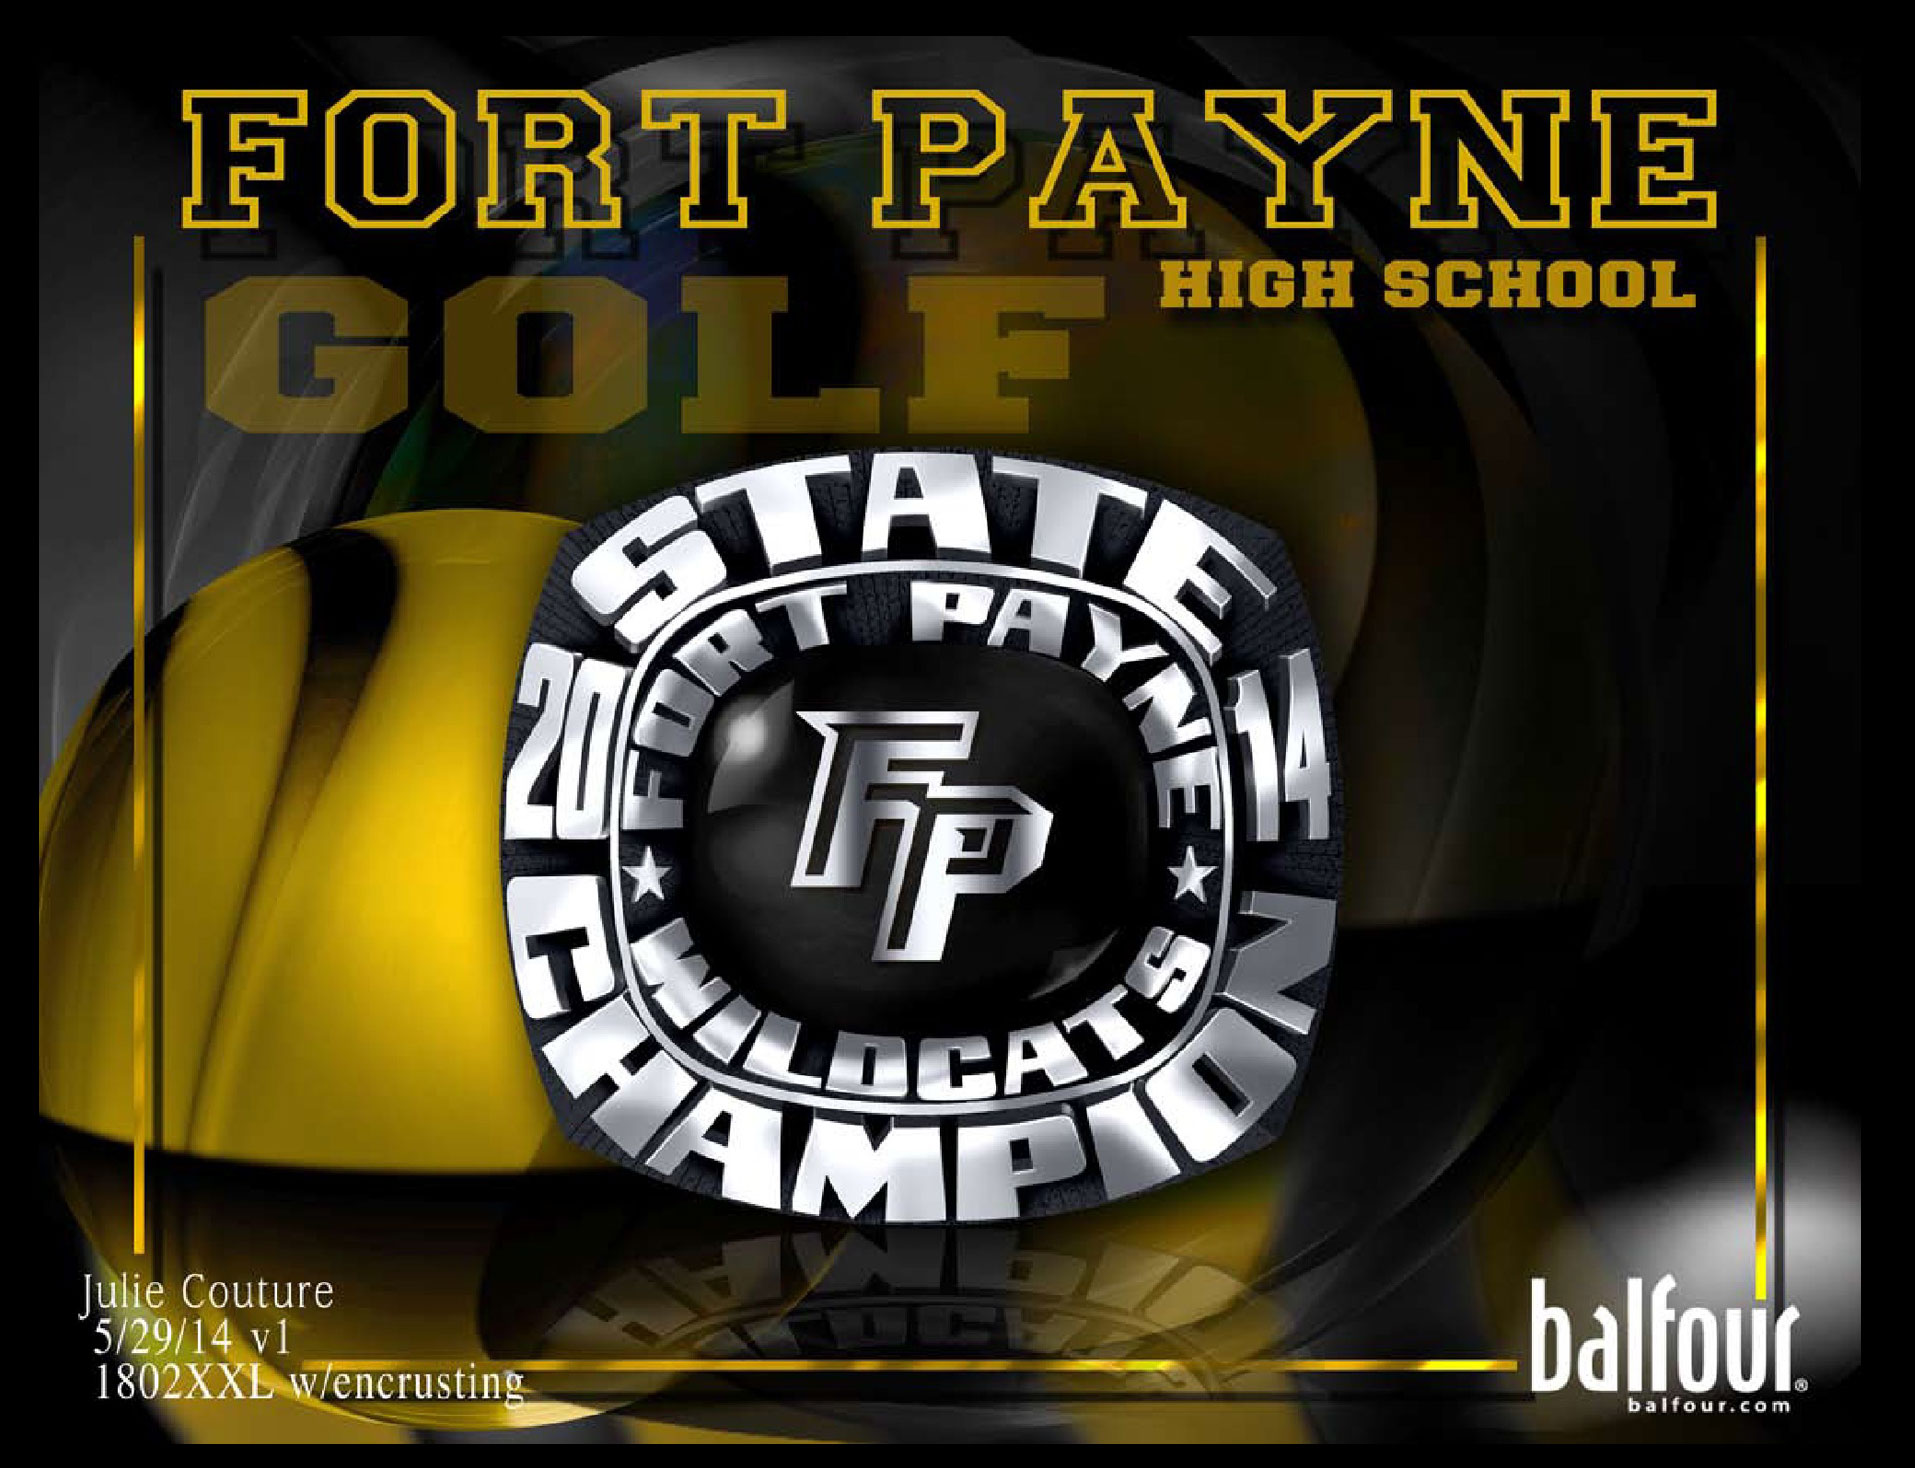 fort payne golf high school championship rings